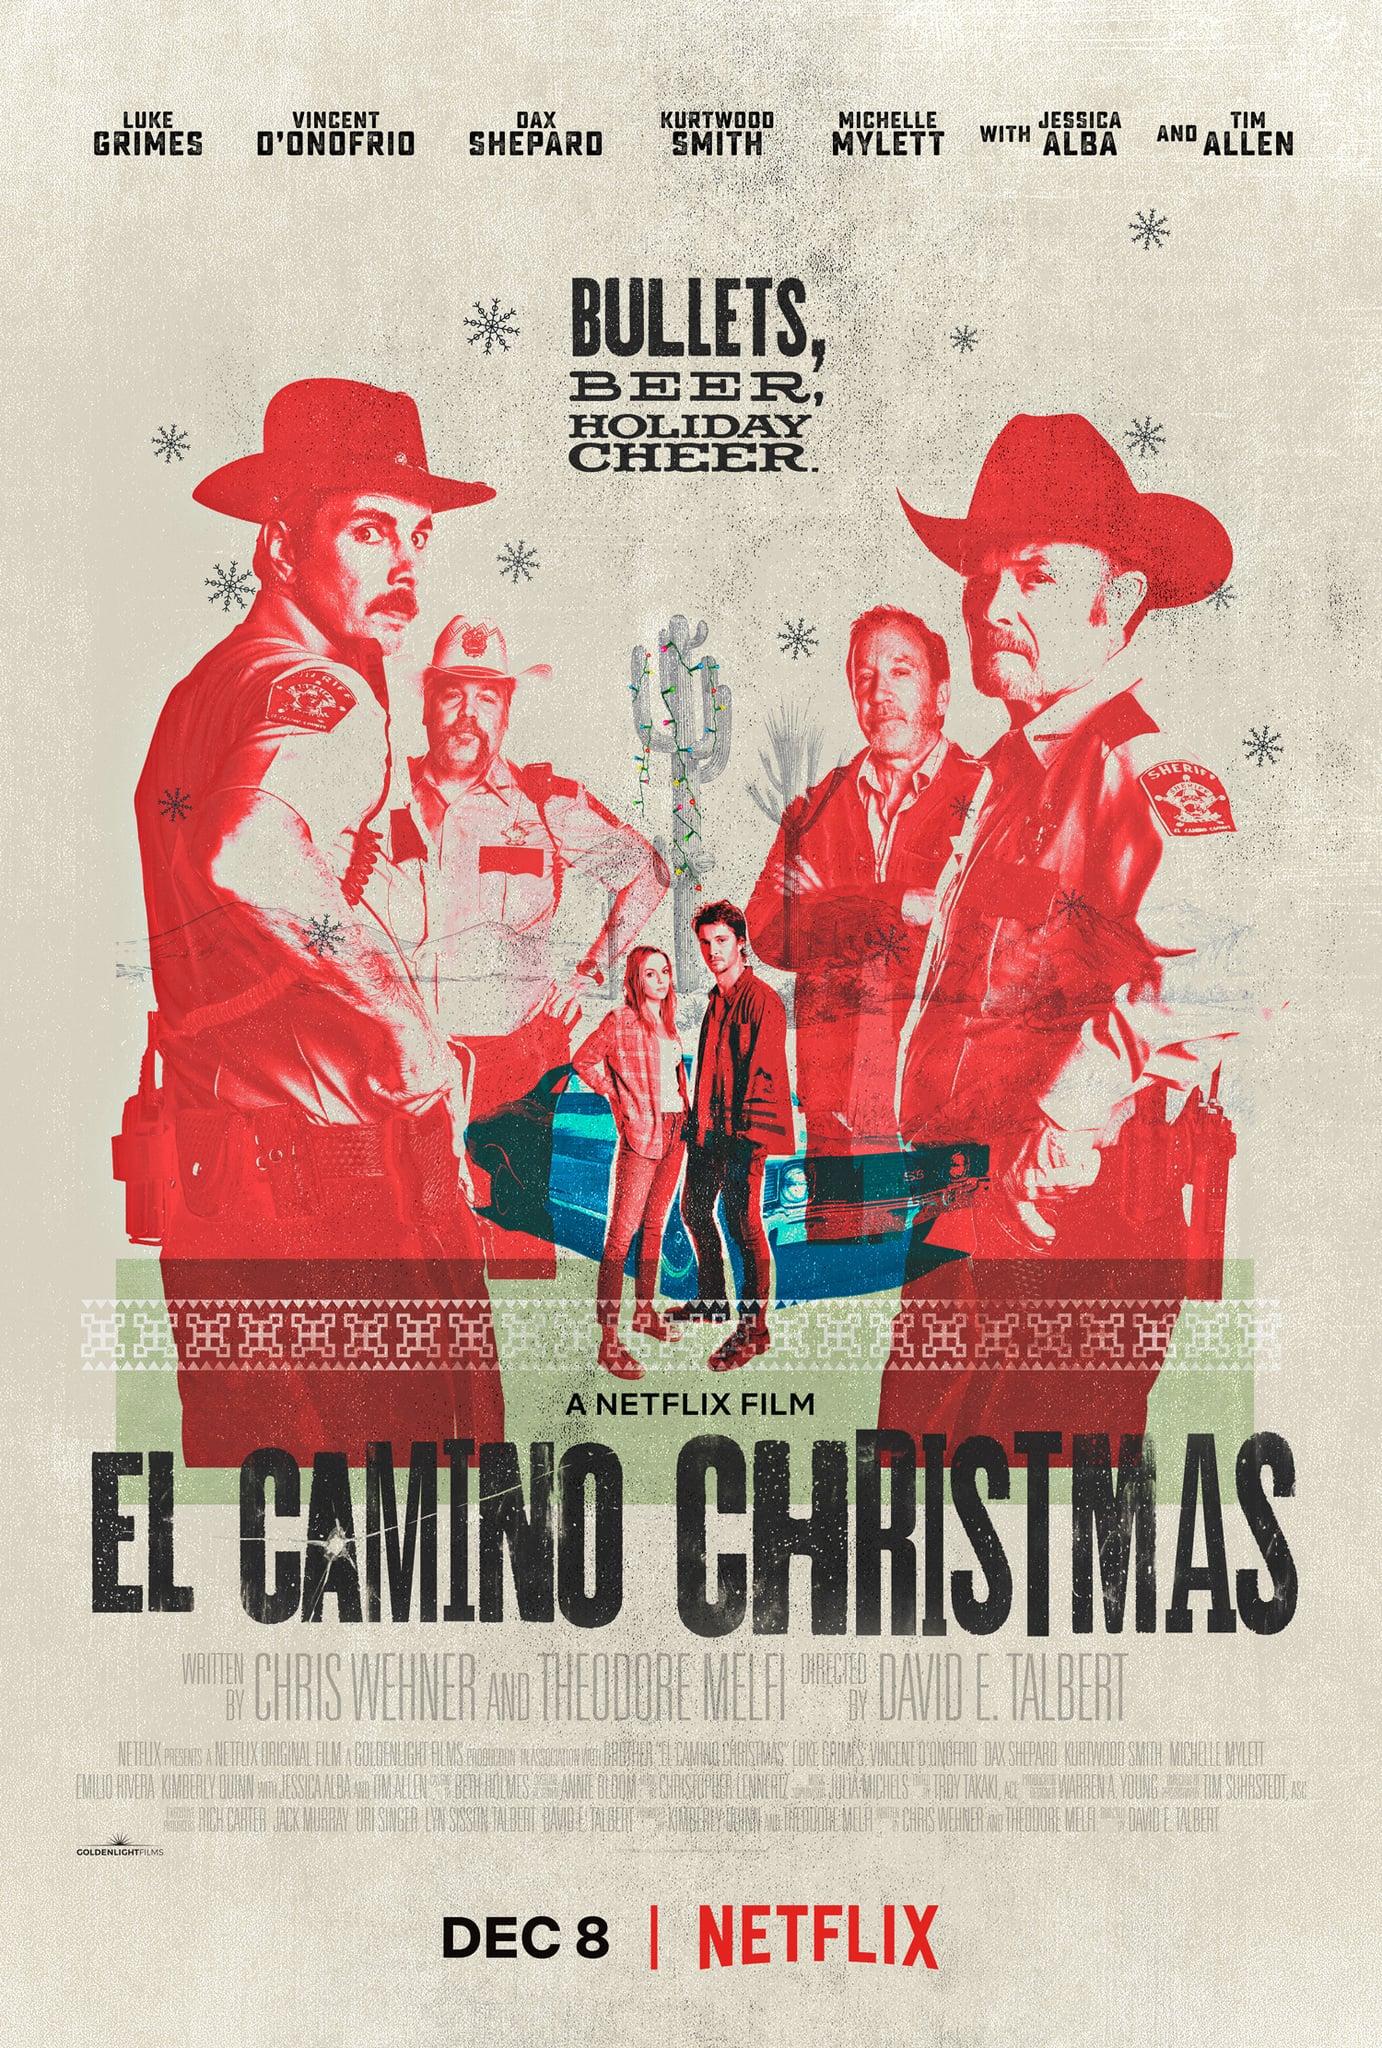 El Camino Christmas (2019) El Camino Christmas | Jingle All the Way to the Holidays With